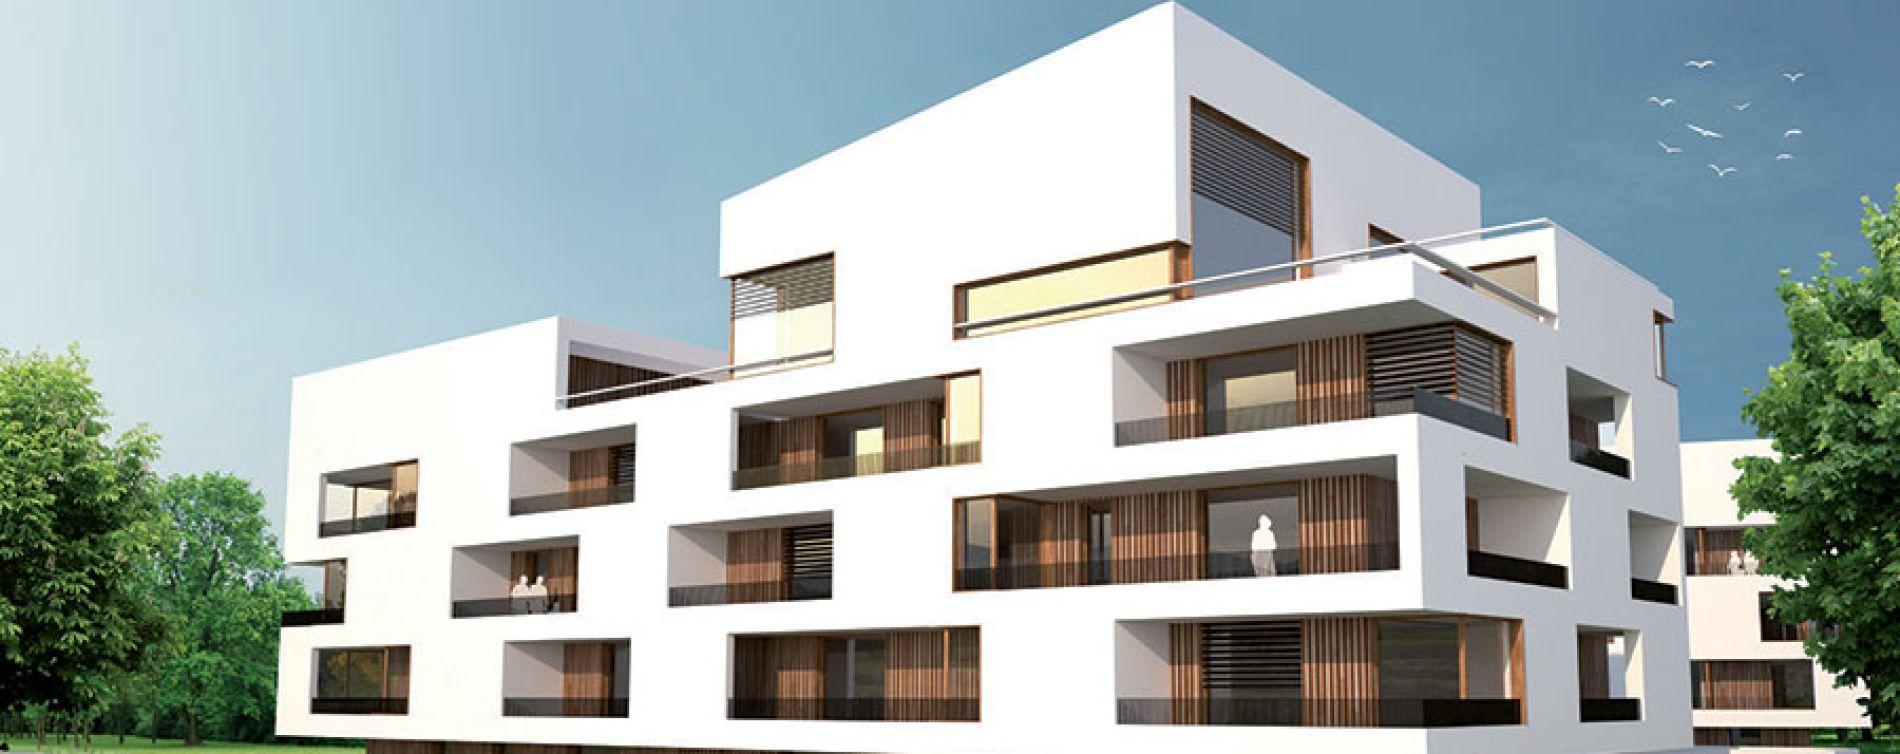 les bor ales tr1 ostwald programme immobilier neuf n 210223. Black Bedroom Furniture Sets. Home Design Ideas